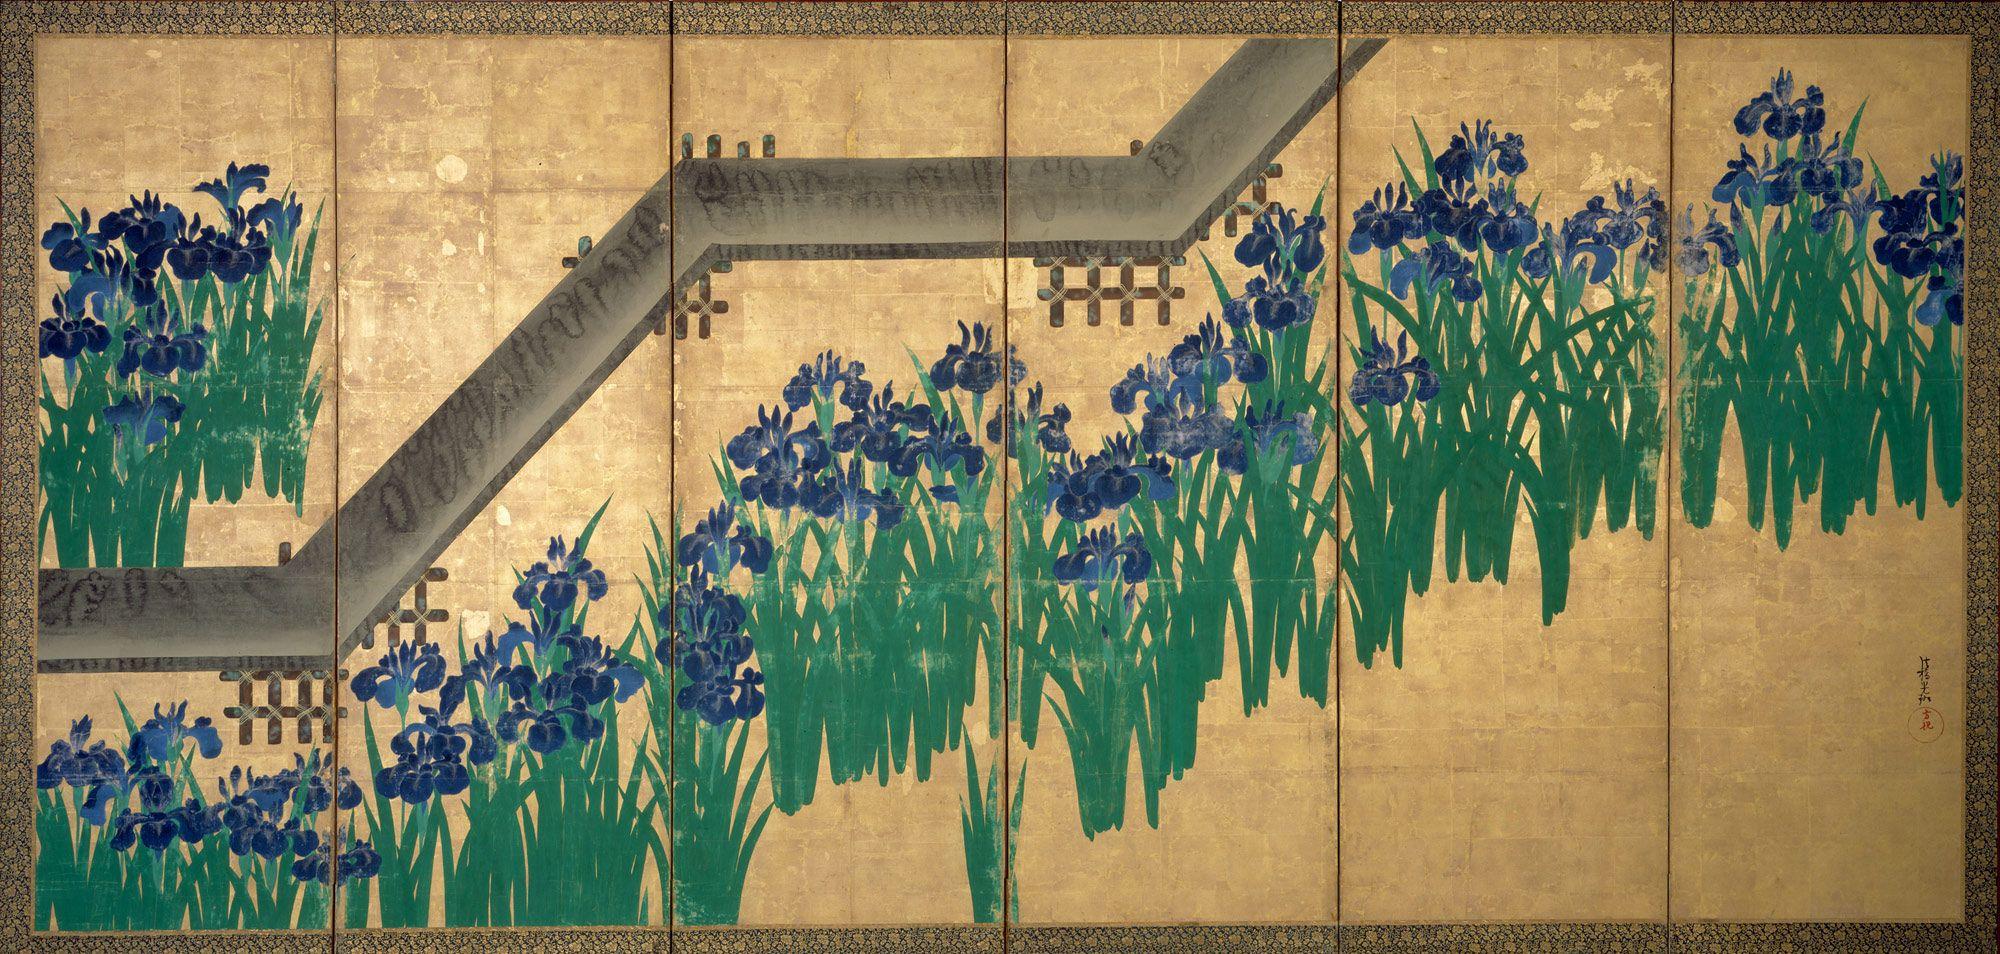 Color in japanese art -  Br Irises At Yatsuhashi Eight Bridges Artist Ogata K Rin Japanese Period Edo Period Date After 1709 Culture Japan Medium Pair Of